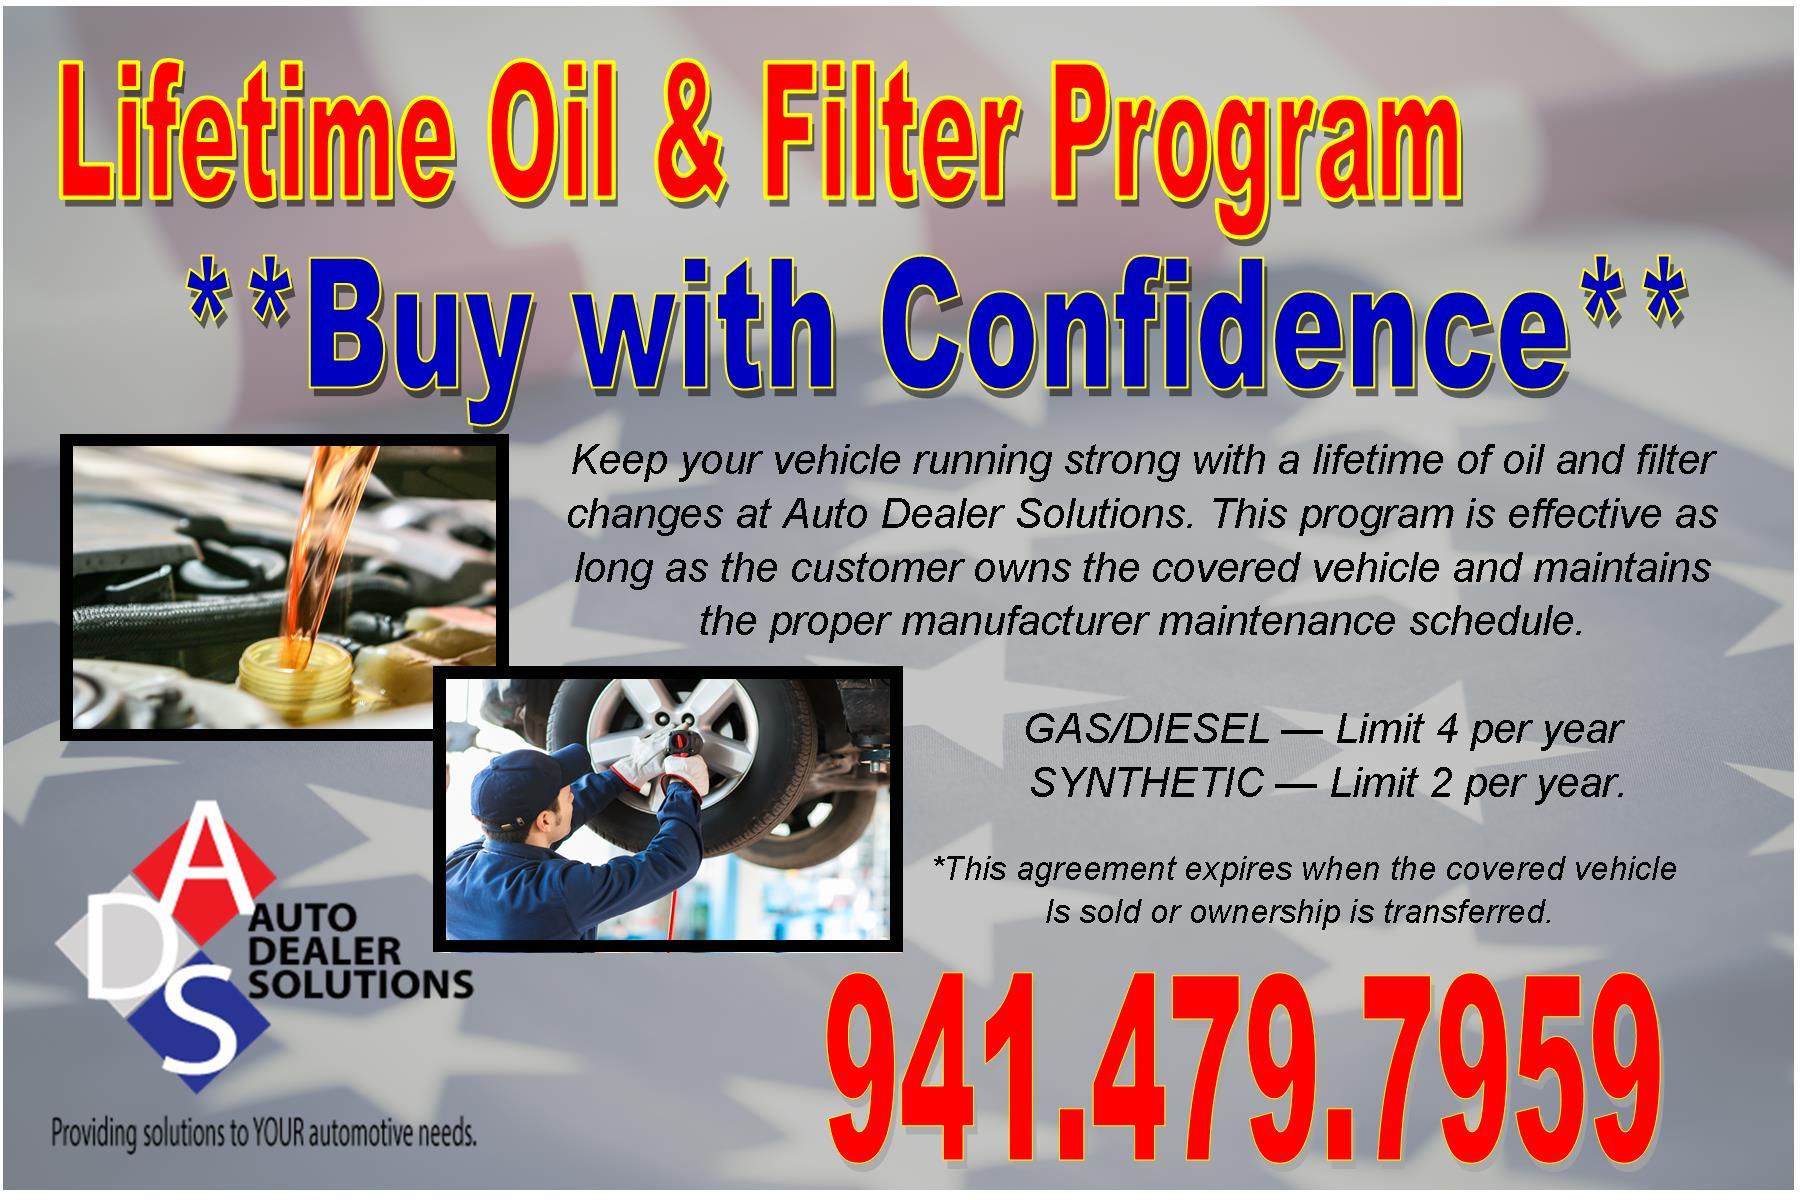 Auto Dealer Solutions image 1